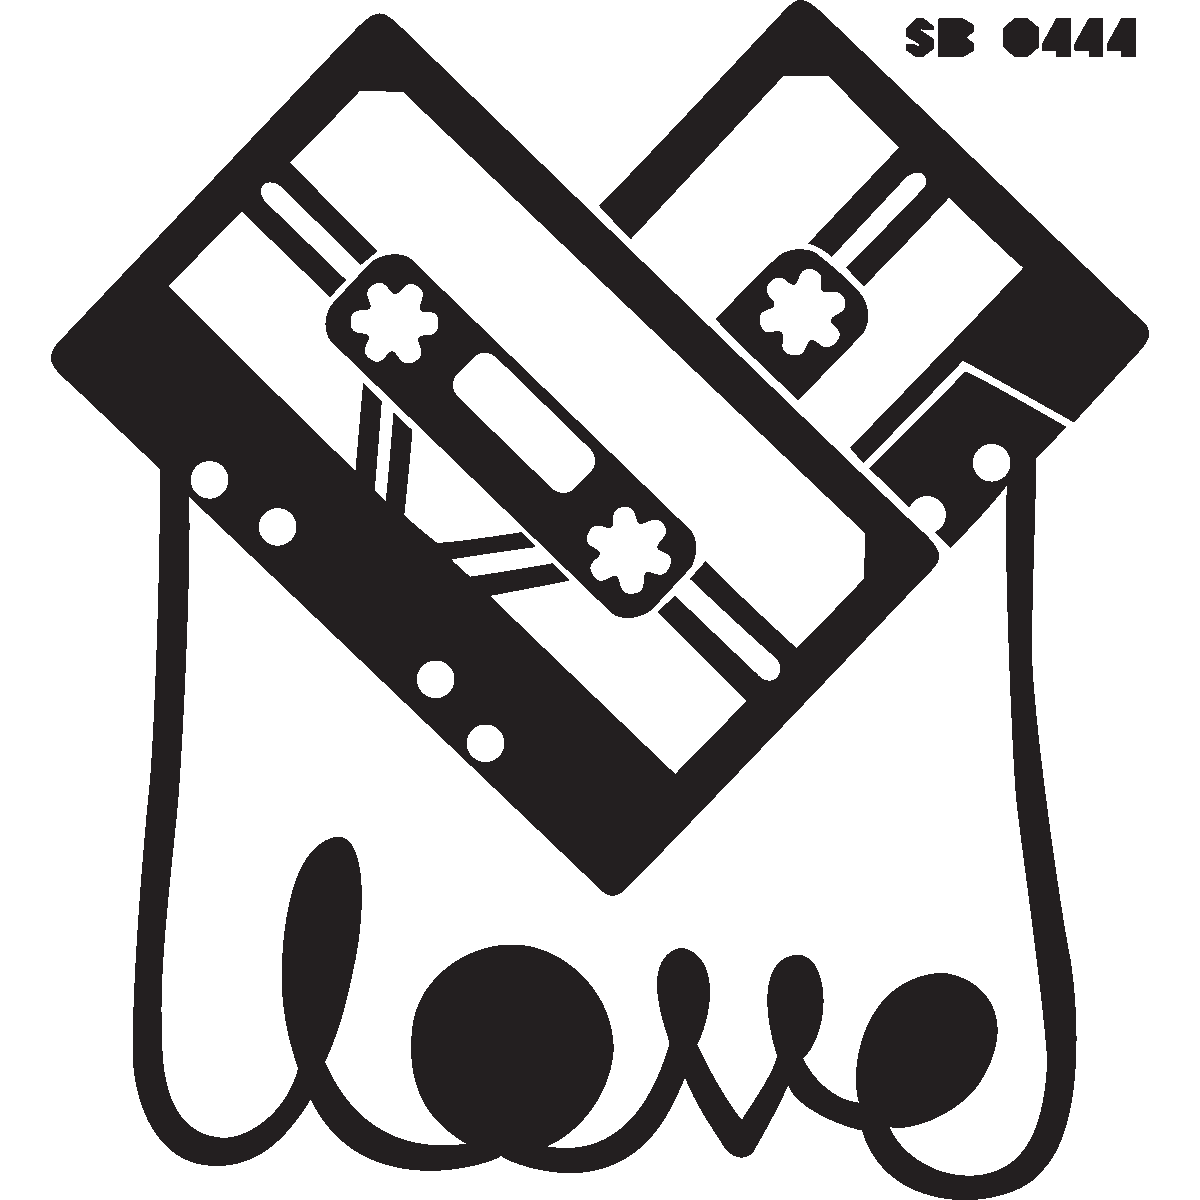 Muurstickers muziek muursticker cassettes love ambiance - Deco kamer stijl engels ...